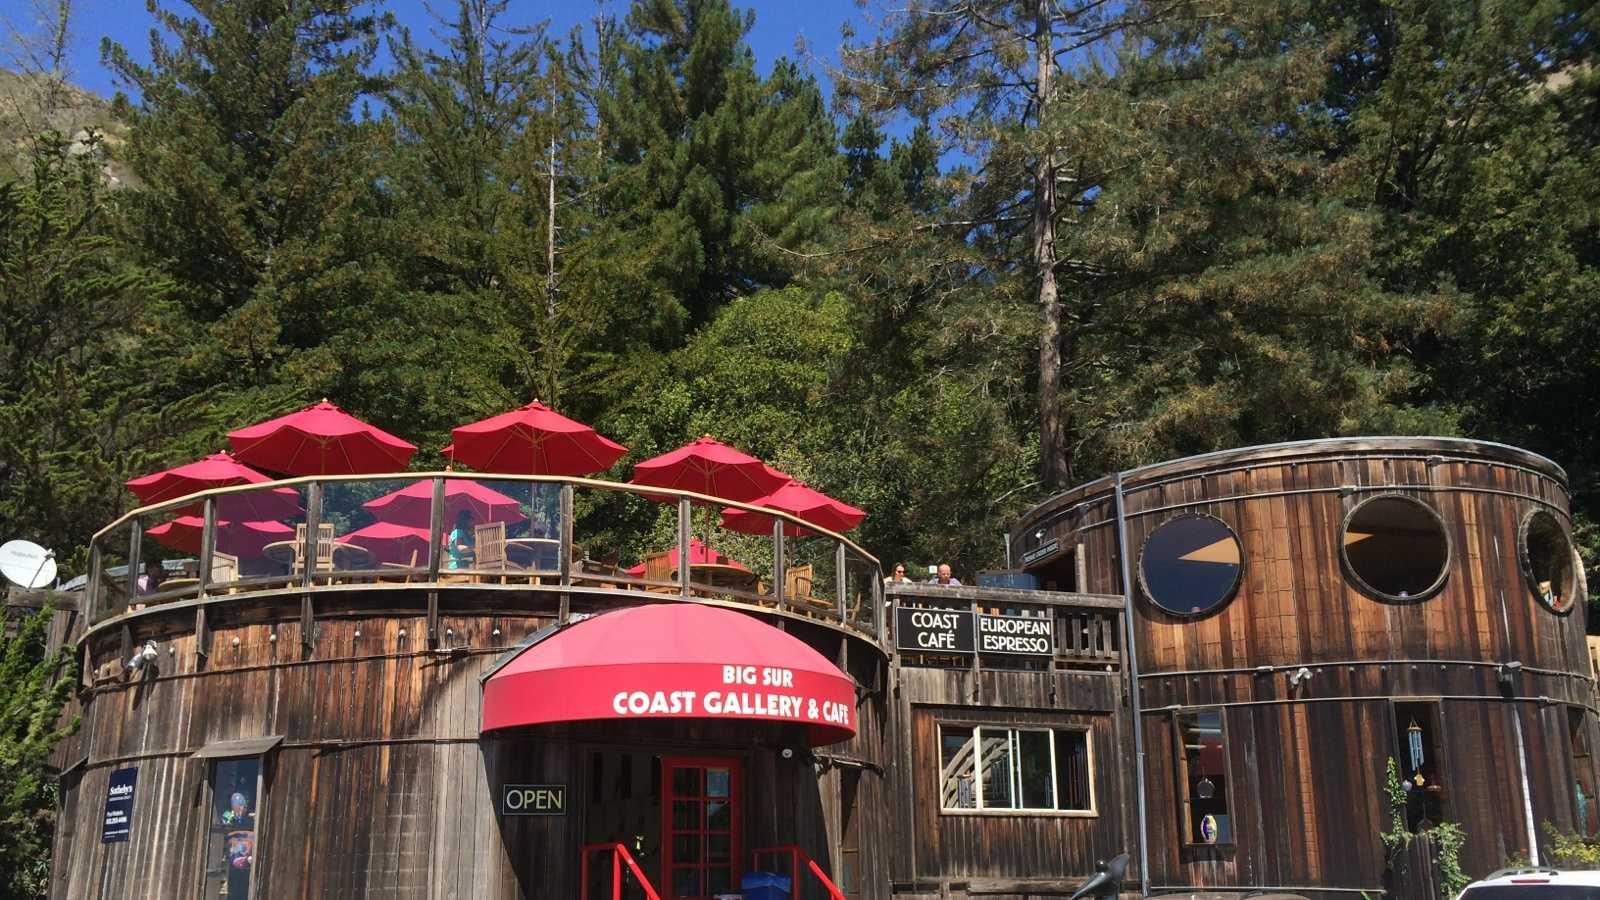 Big Sur Coast Gallery and Cafe.jpg